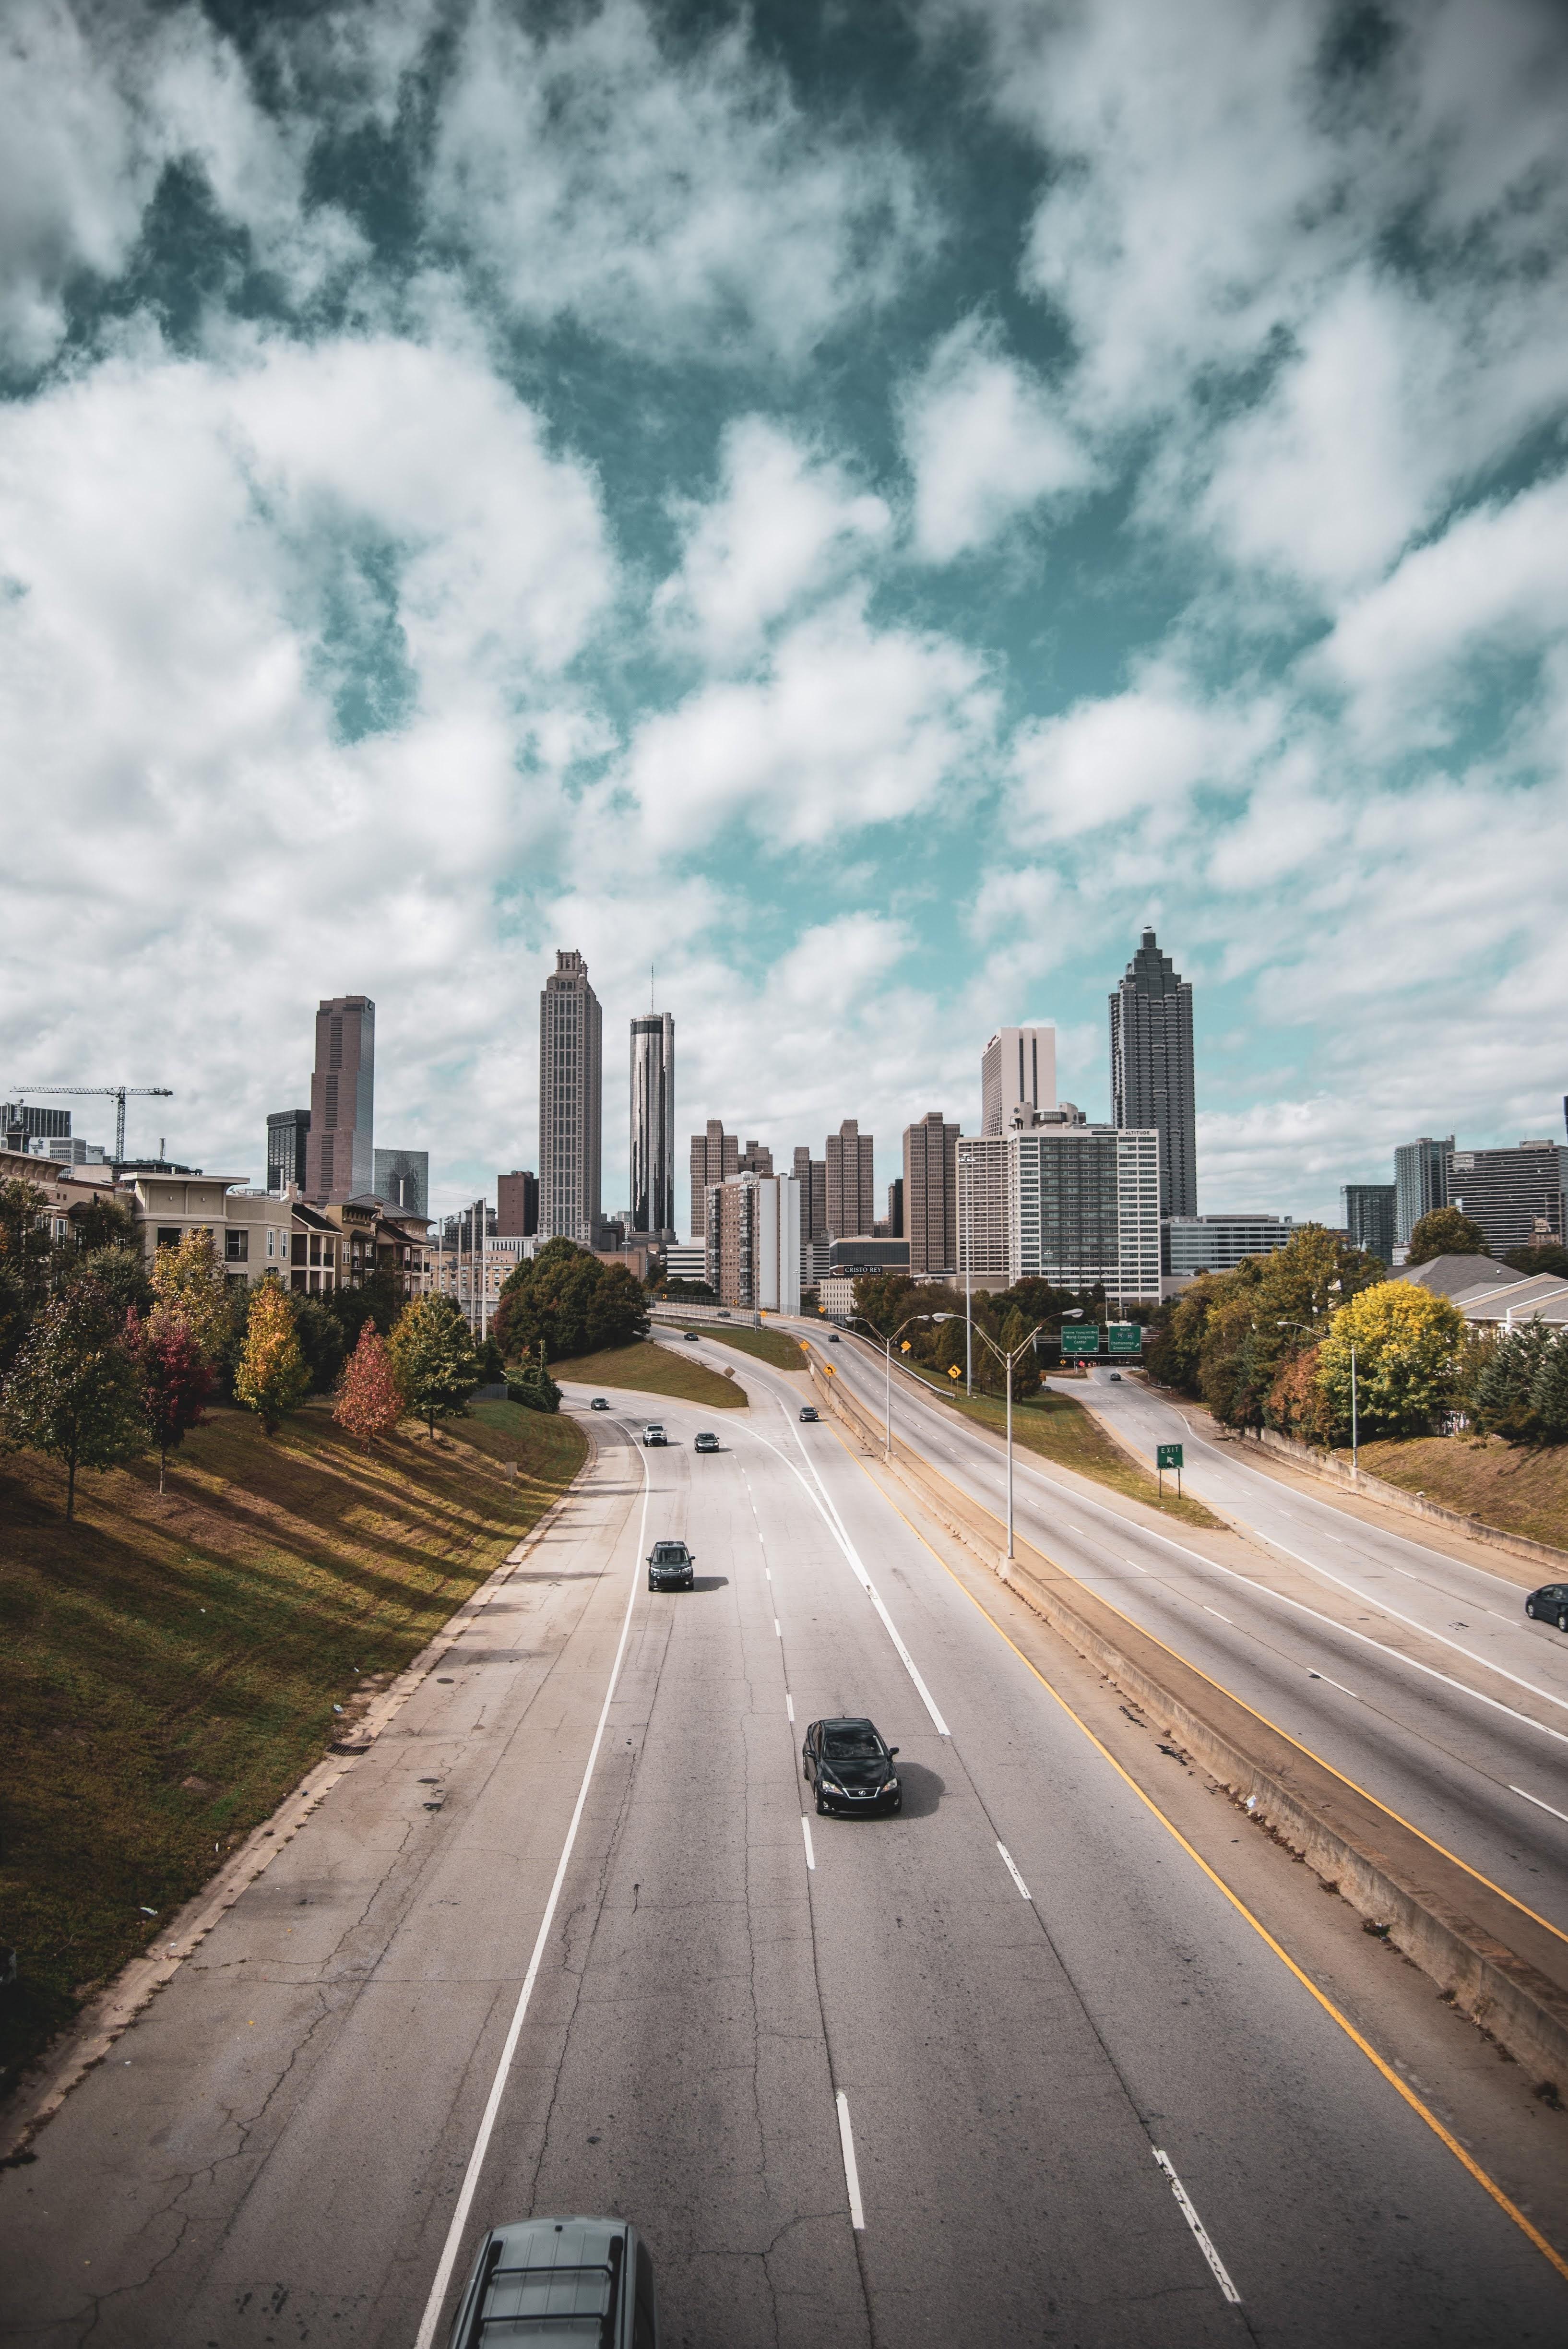 Atlanta Skyline | Photo by Ronny Sison via Unsplash